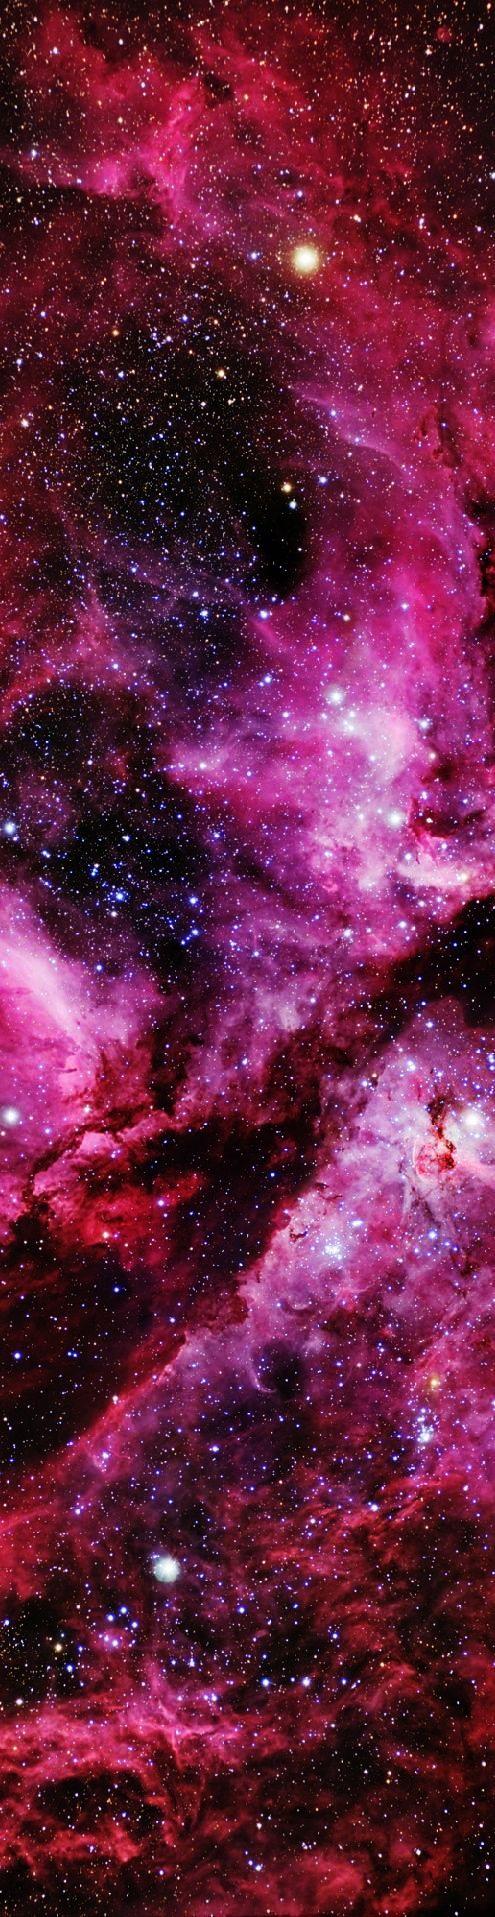 pinterest // @alphaweasel ♡ | galáxias. | pinterest | spaces